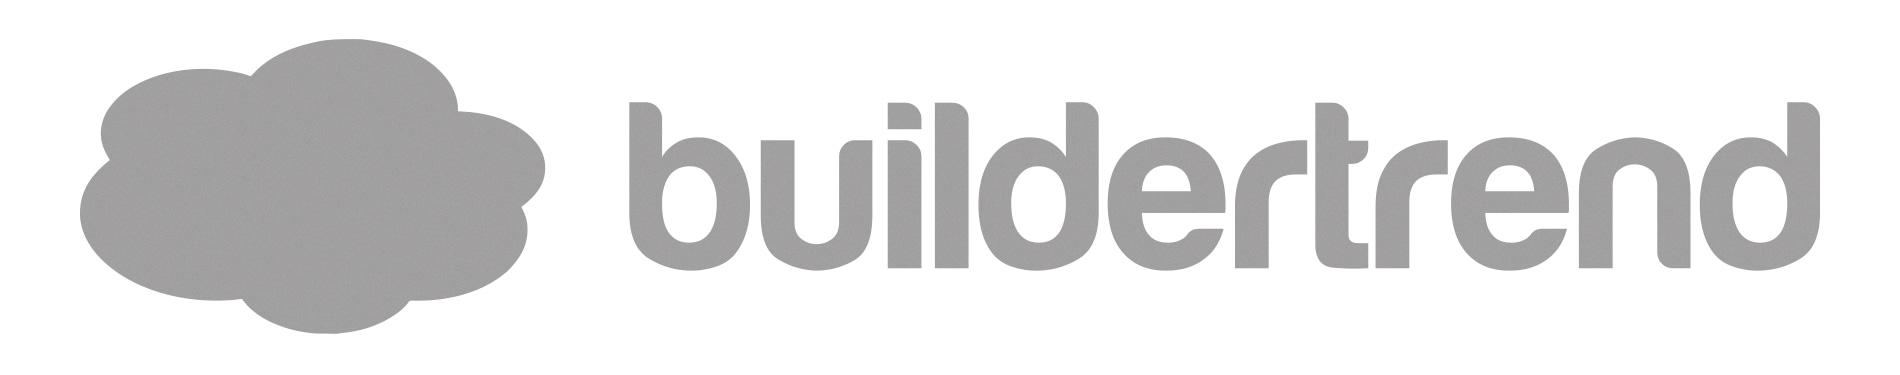 https://cdn.linkadvisors.com.au/wp-content/uploads/media/2020/01/buildertrend-logo-copy.jpg